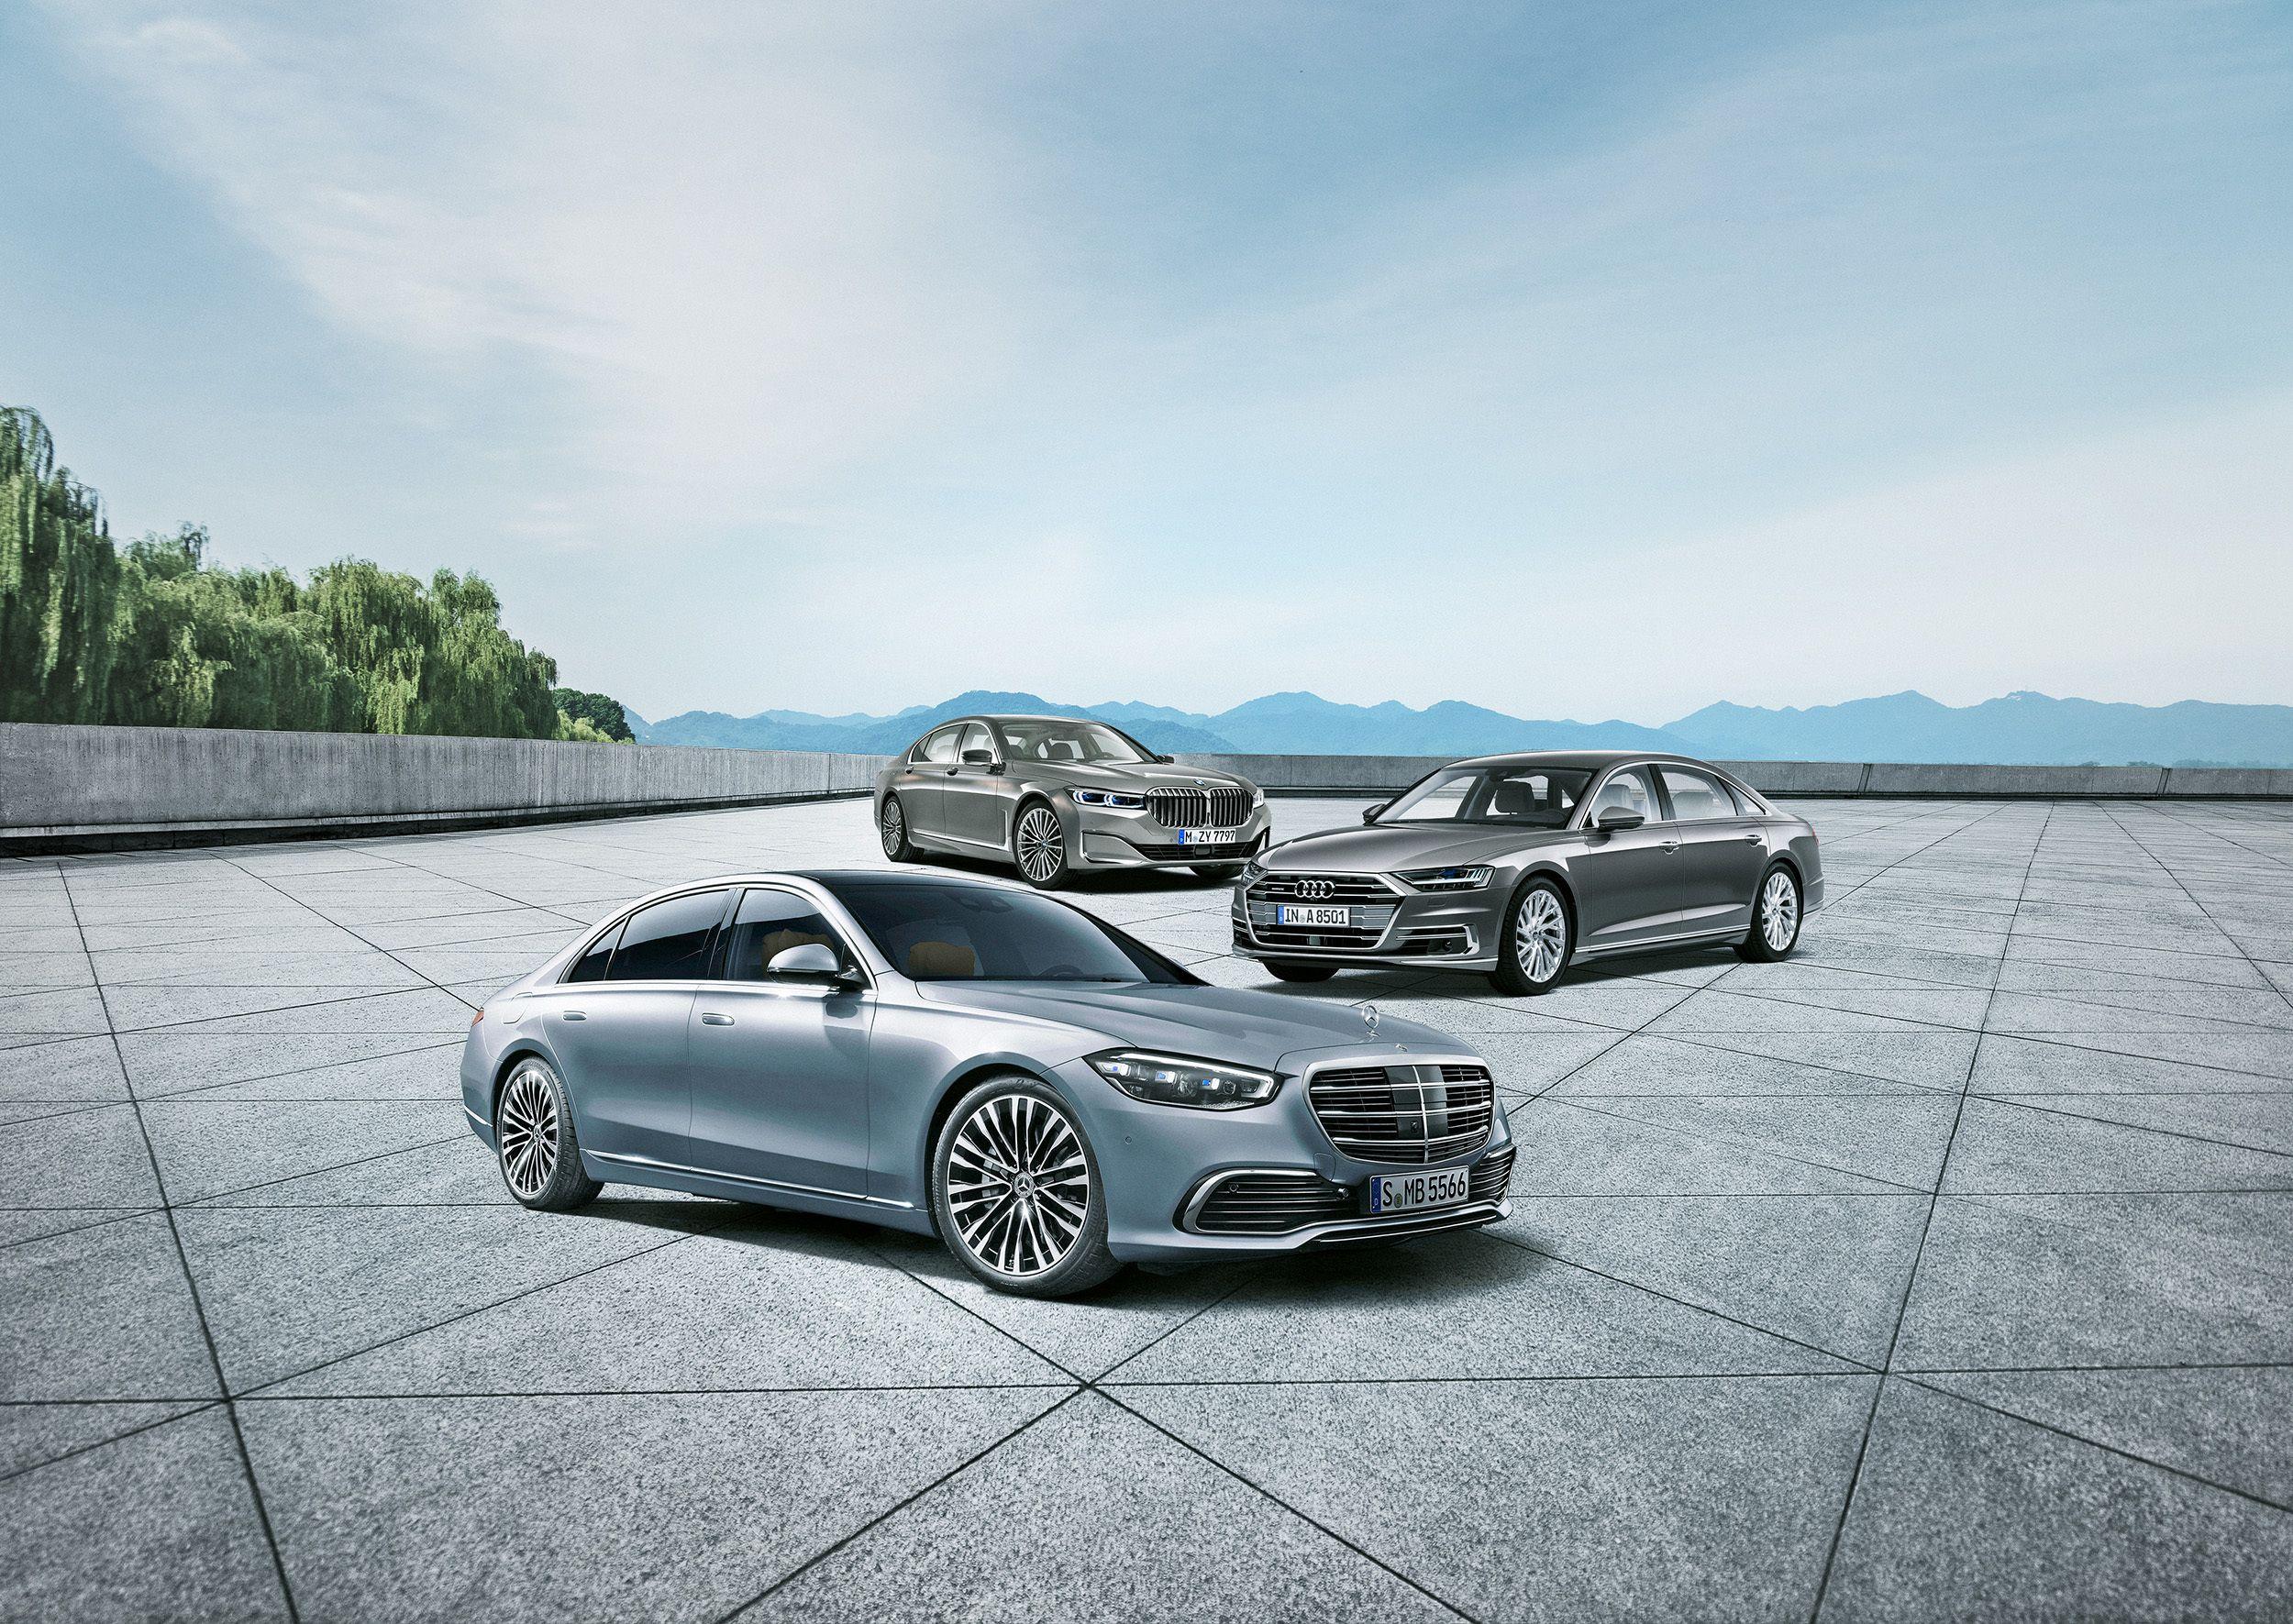 2021 Mercedes Benz S Class Vs Bmw And Audi S Flagship Sedans